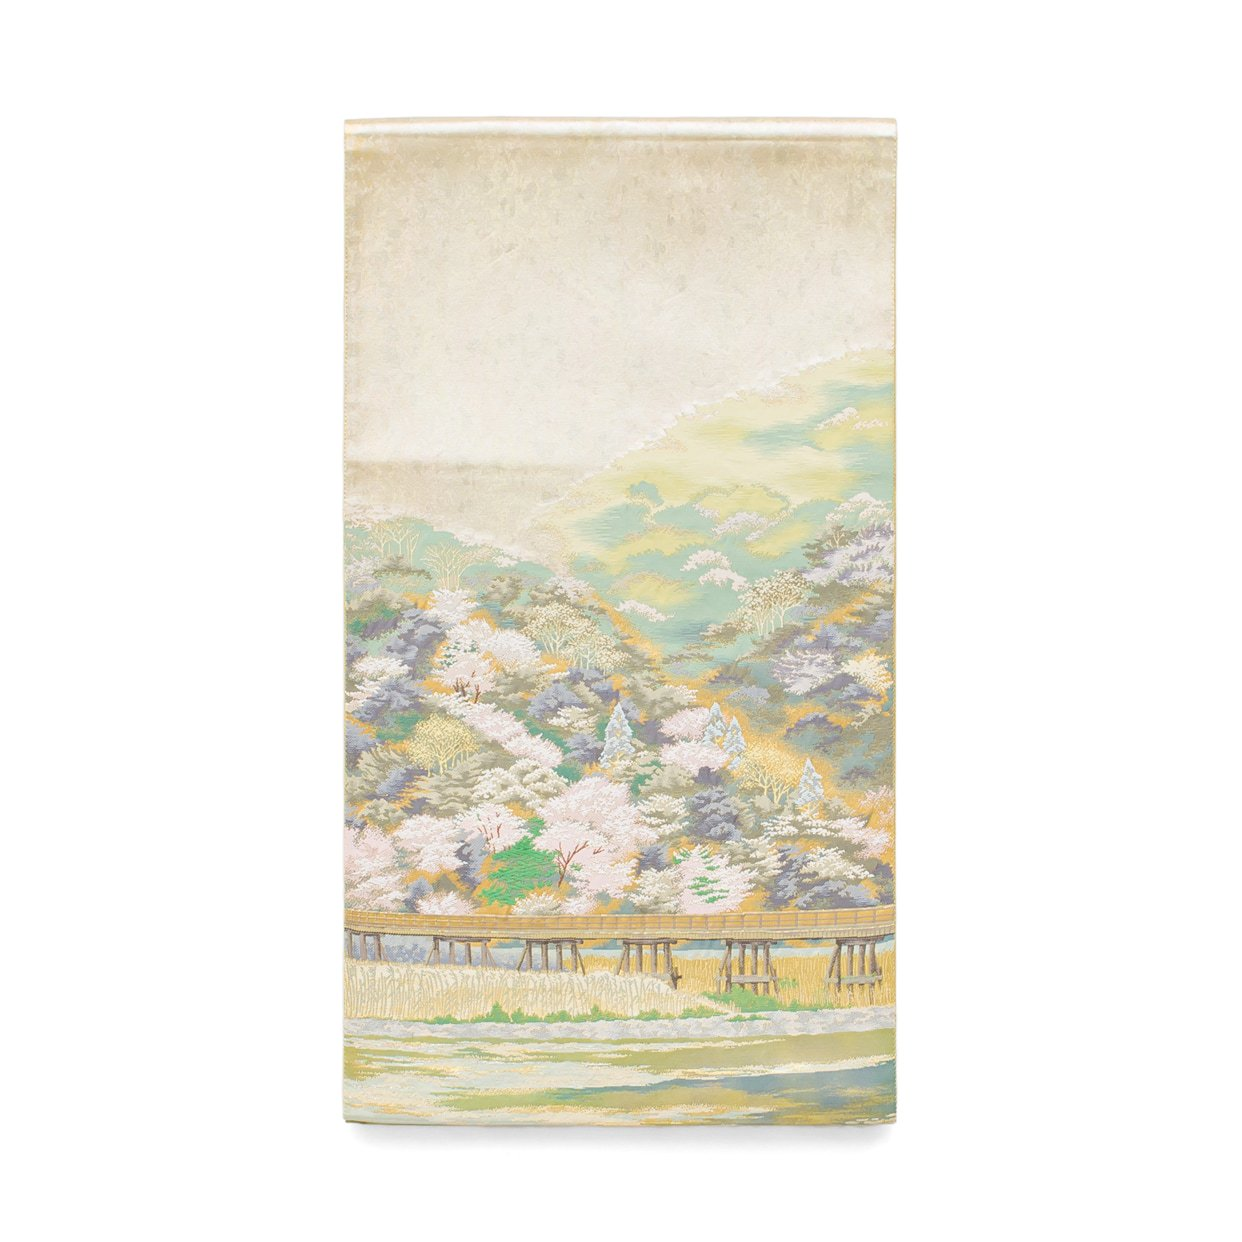 「袋帯●嵐山渡月橋」の商品画像